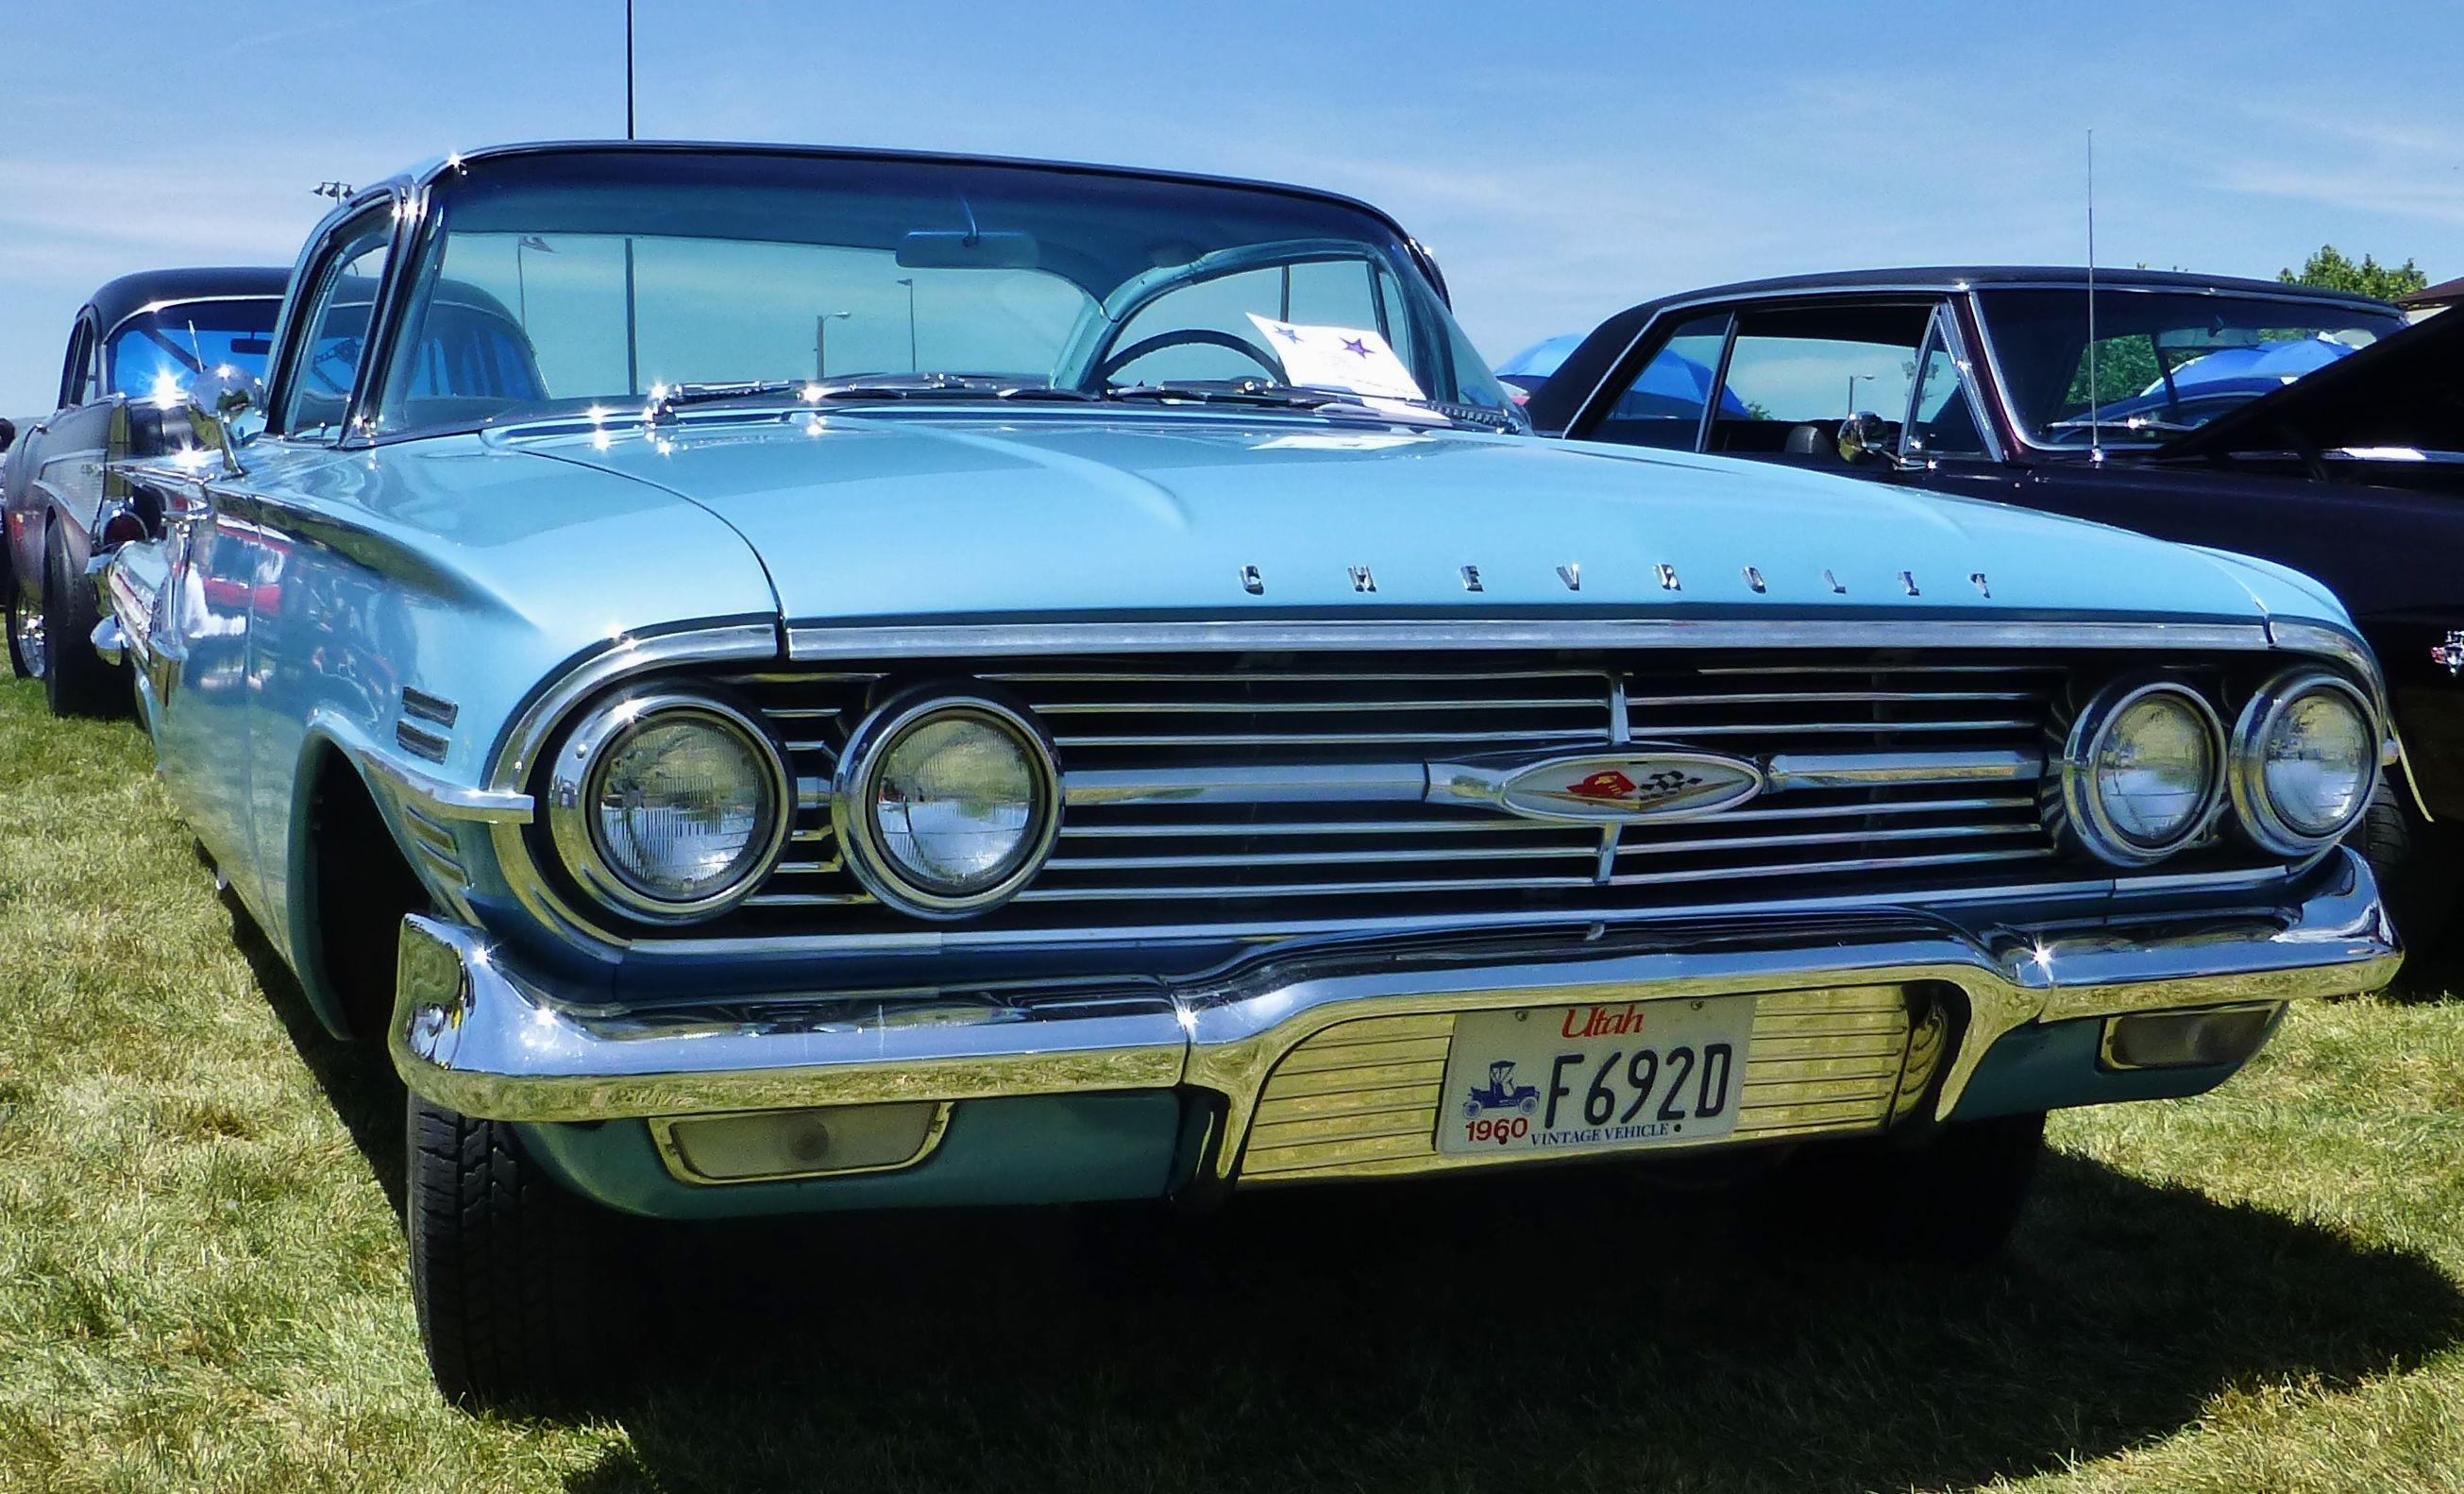 1960 Chevrolet Impala. Photography by David E. Nelson, 2017 ...